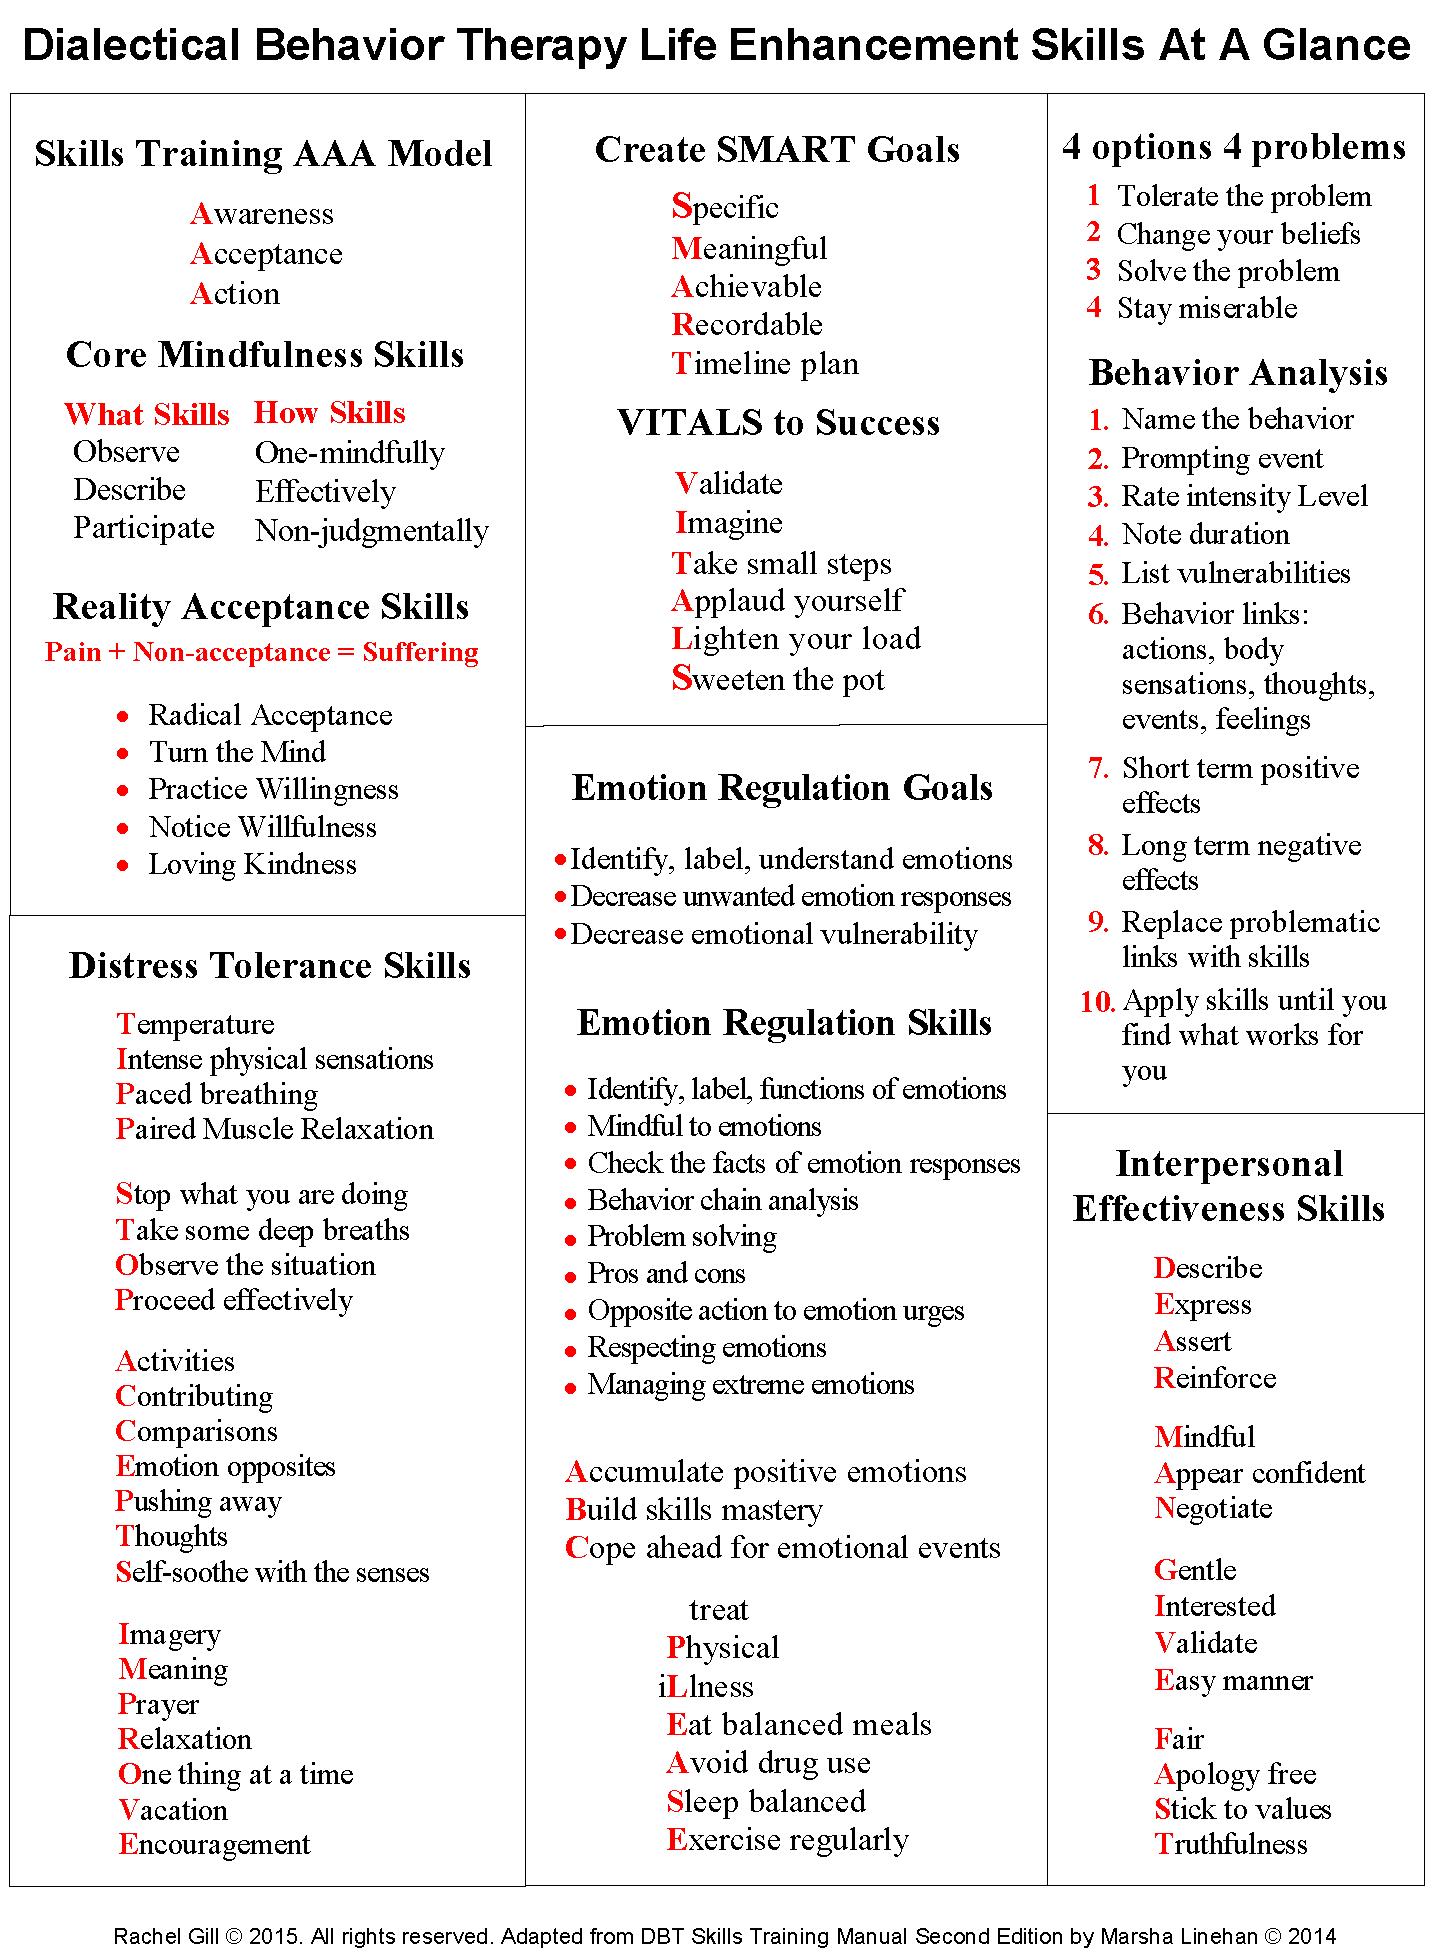 Dbt Skills Training Modules Handouts & Worksheets Dbt Skills At A - Free Printable Coping Skills Worksheets